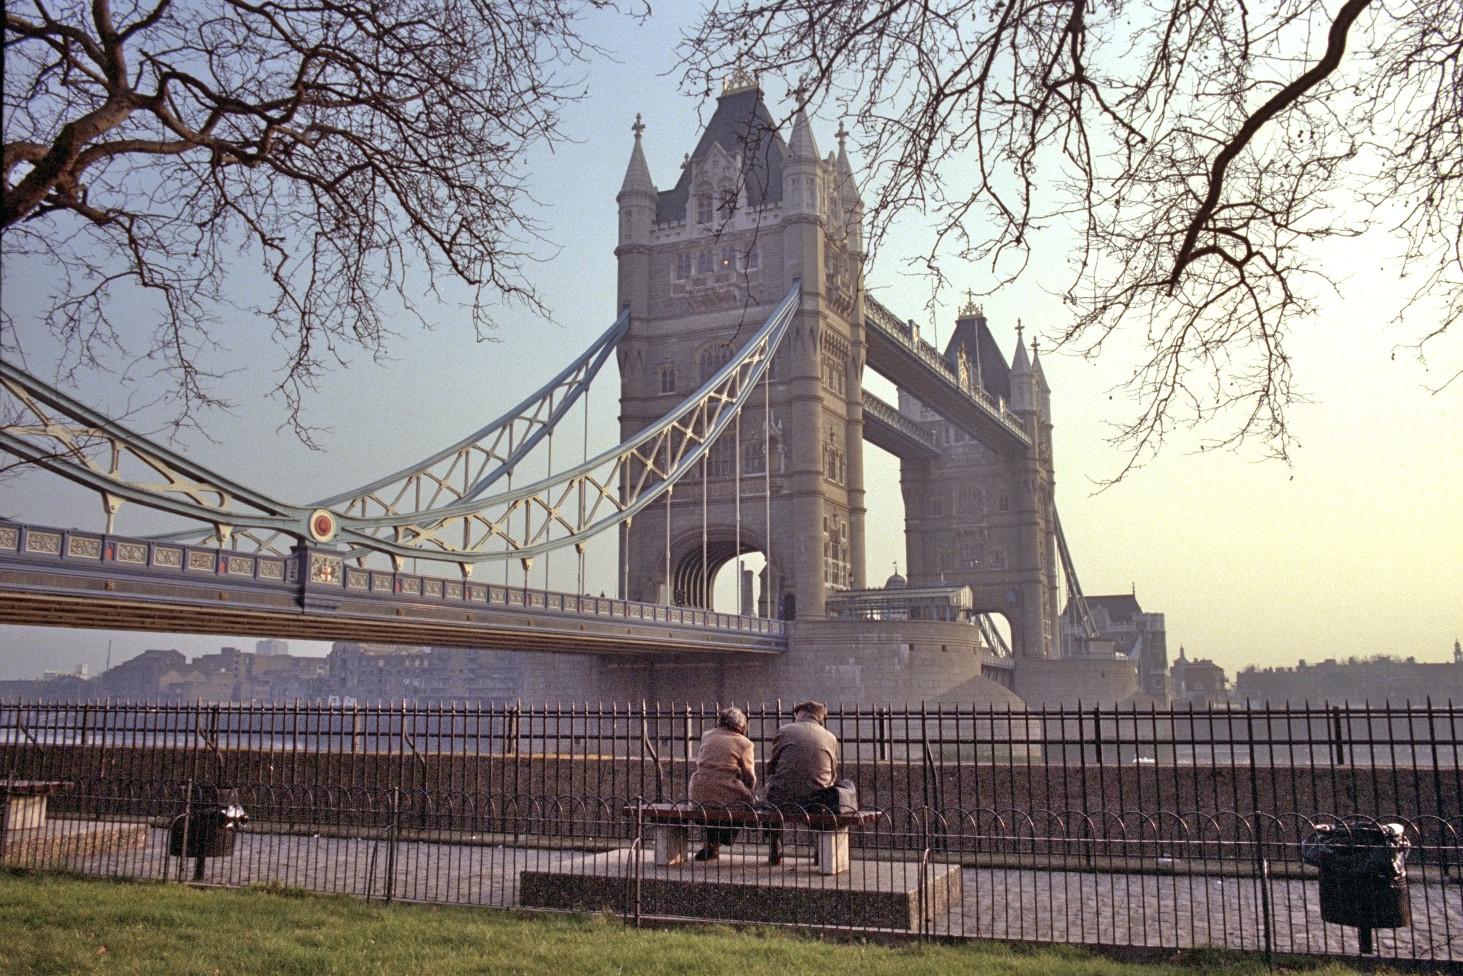 Tower Bridge, London 2